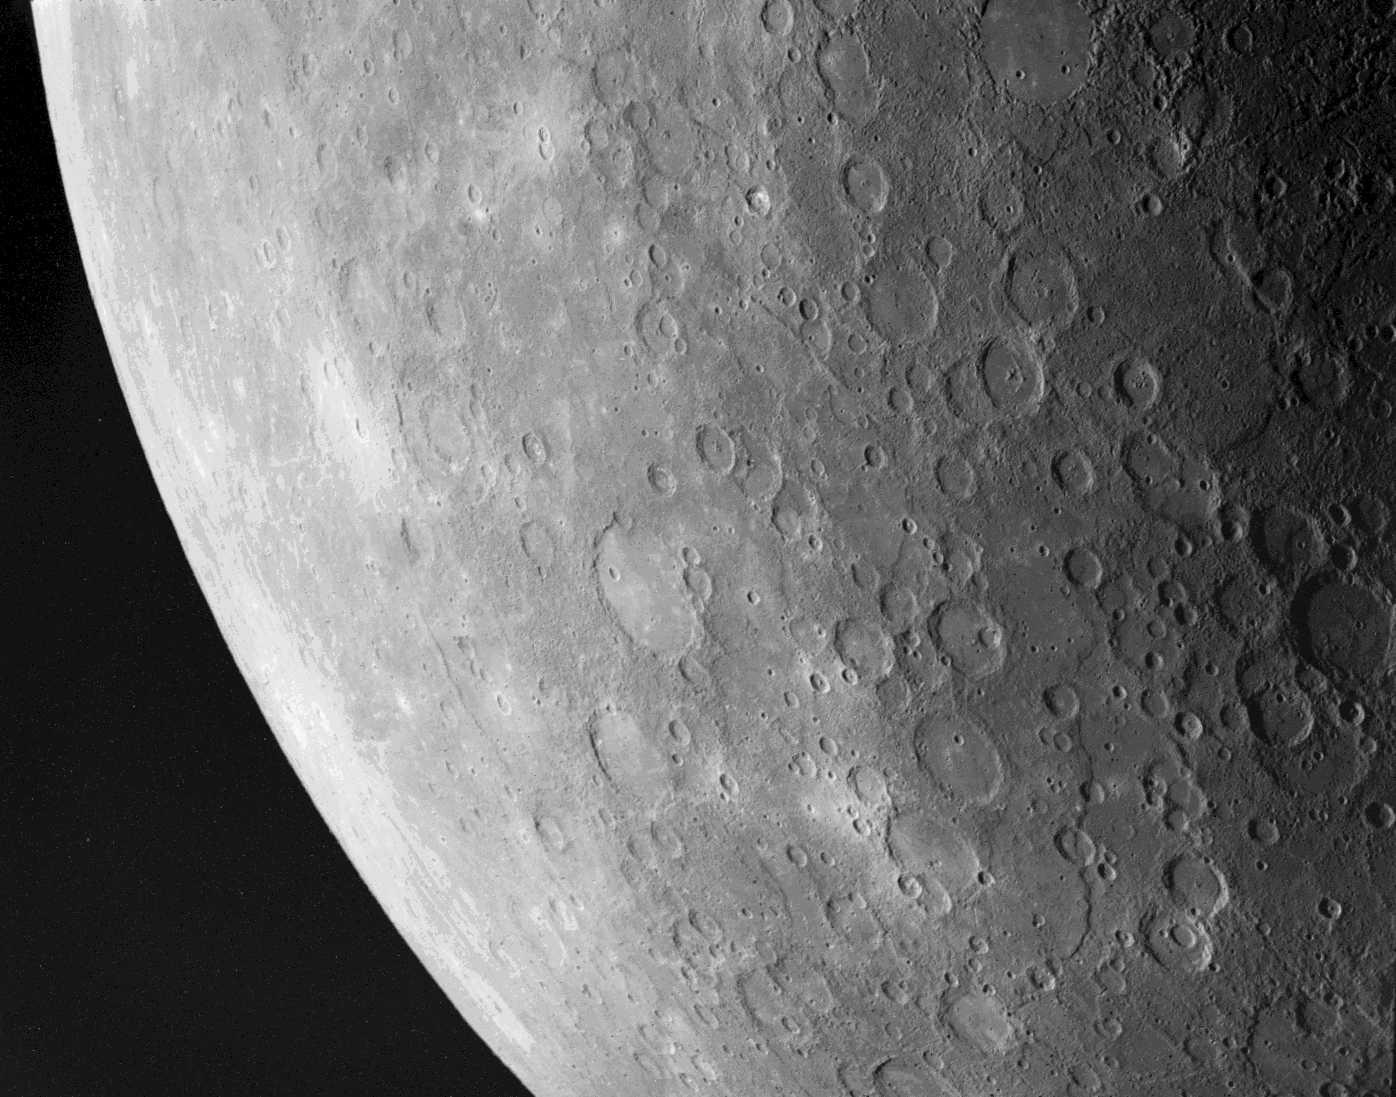 [Image: mercury2.jpg]